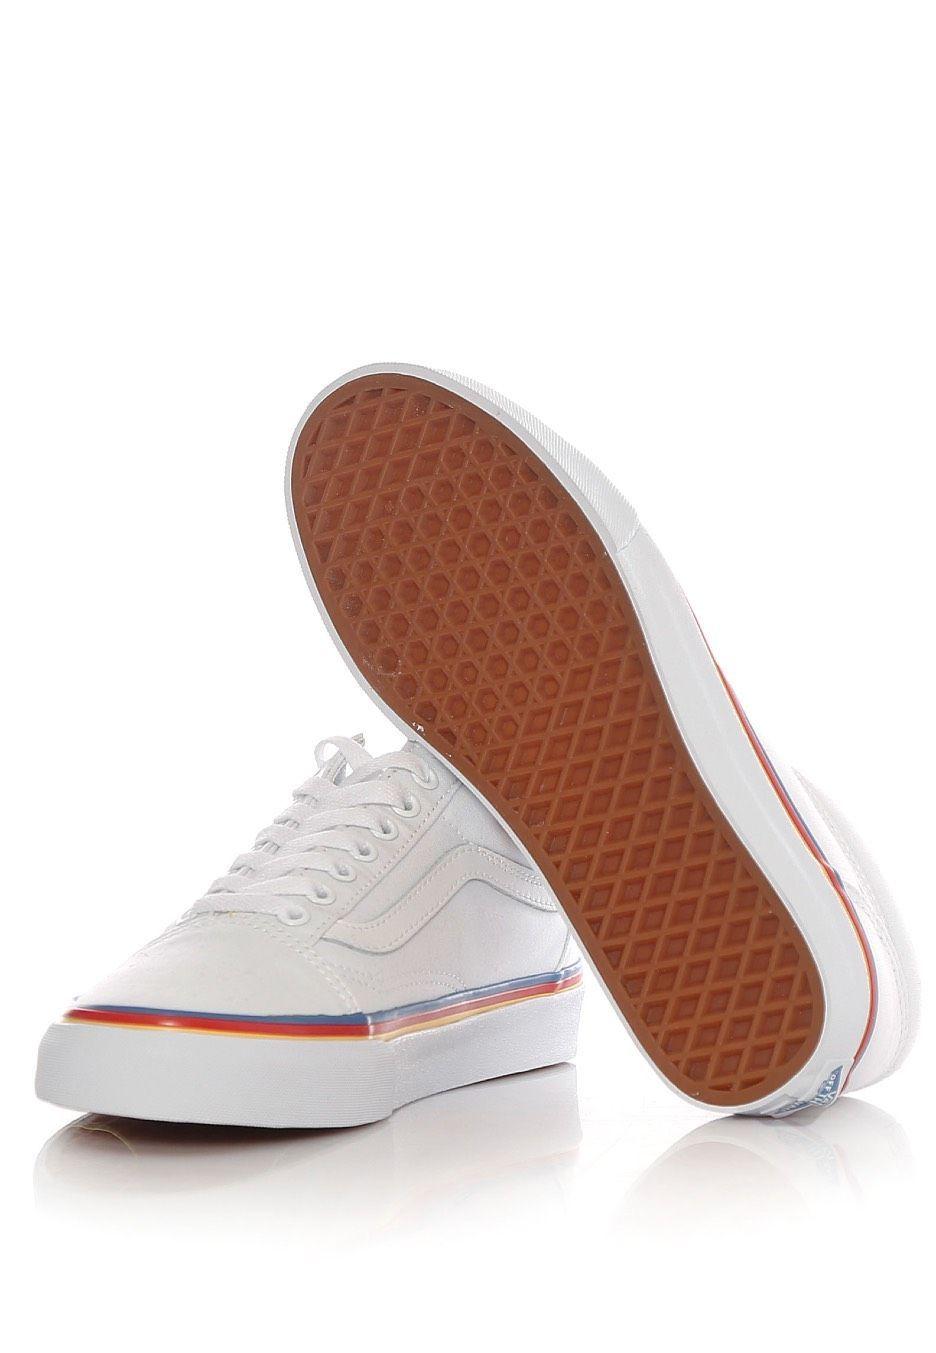 4ad64e29e242b4 Vans - Old Skool Rainbow Foxing True White - Girl Schuhe im Impericon Shop  - Innerhalb von 24 Stunden versandfertig - 30 Tage Rückgaberecht